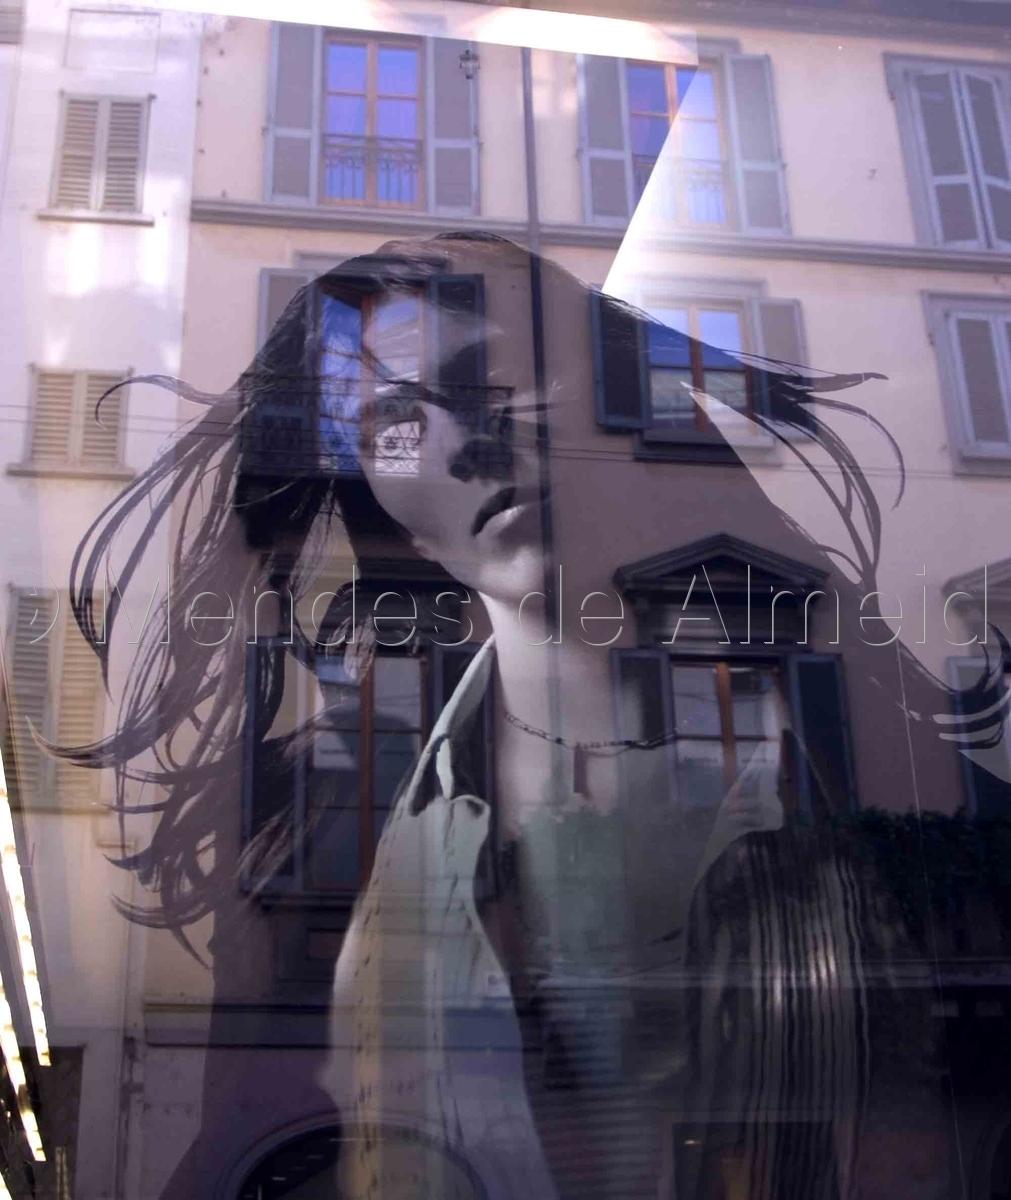 Ao lado - Fantasmas 01 (large view)